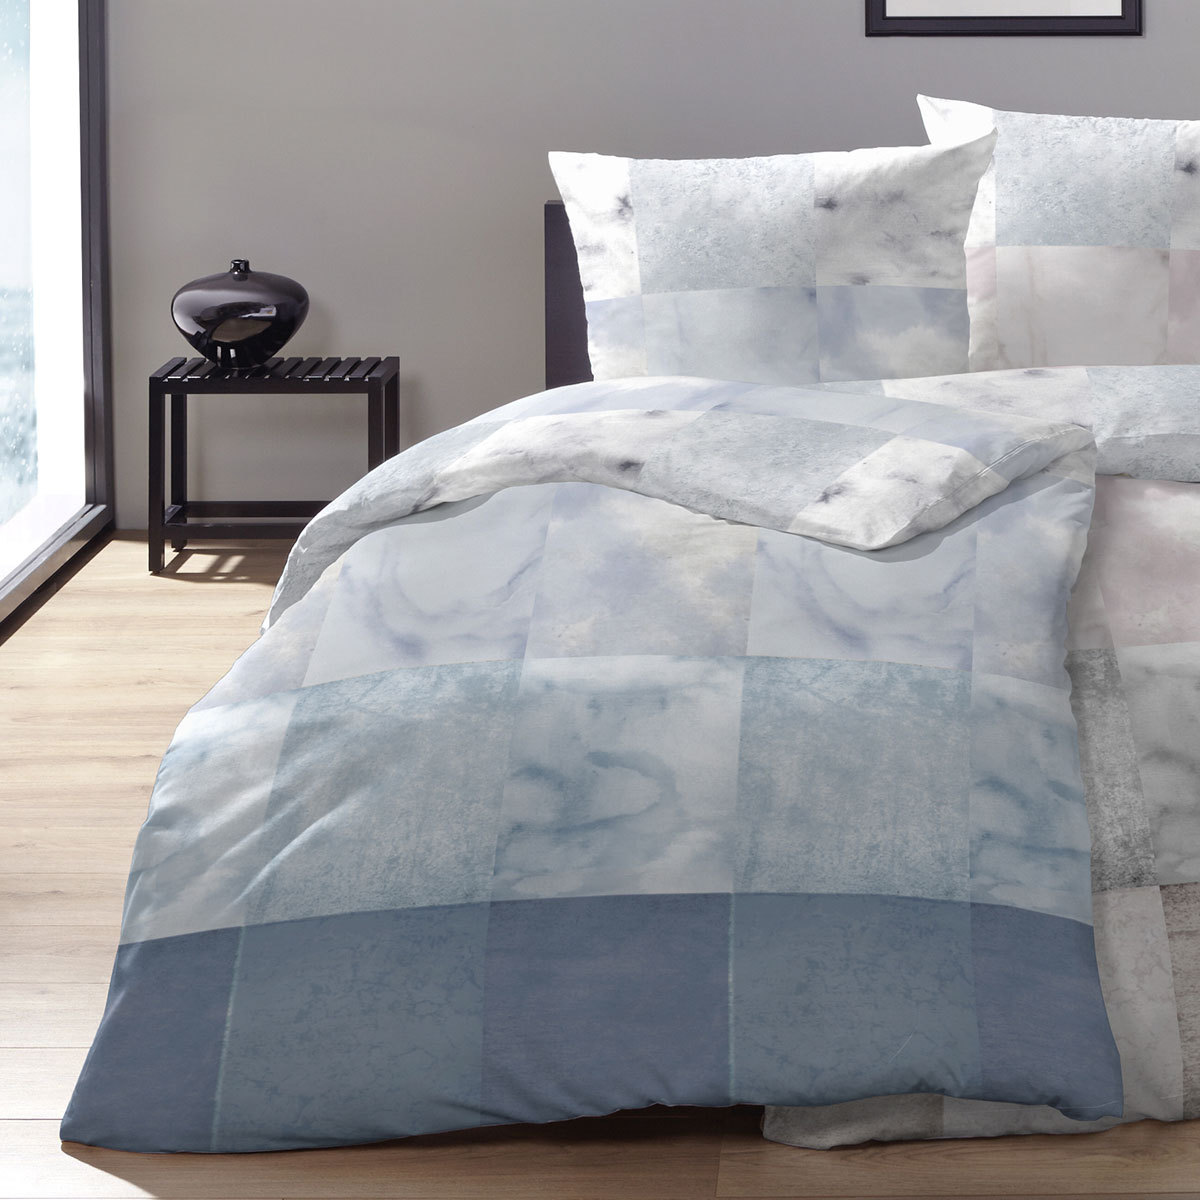 enrico coss edelflanell bettw sche lyon blau g nstig online kaufen bei bettwaren shop. Black Bedroom Furniture Sets. Home Design Ideas